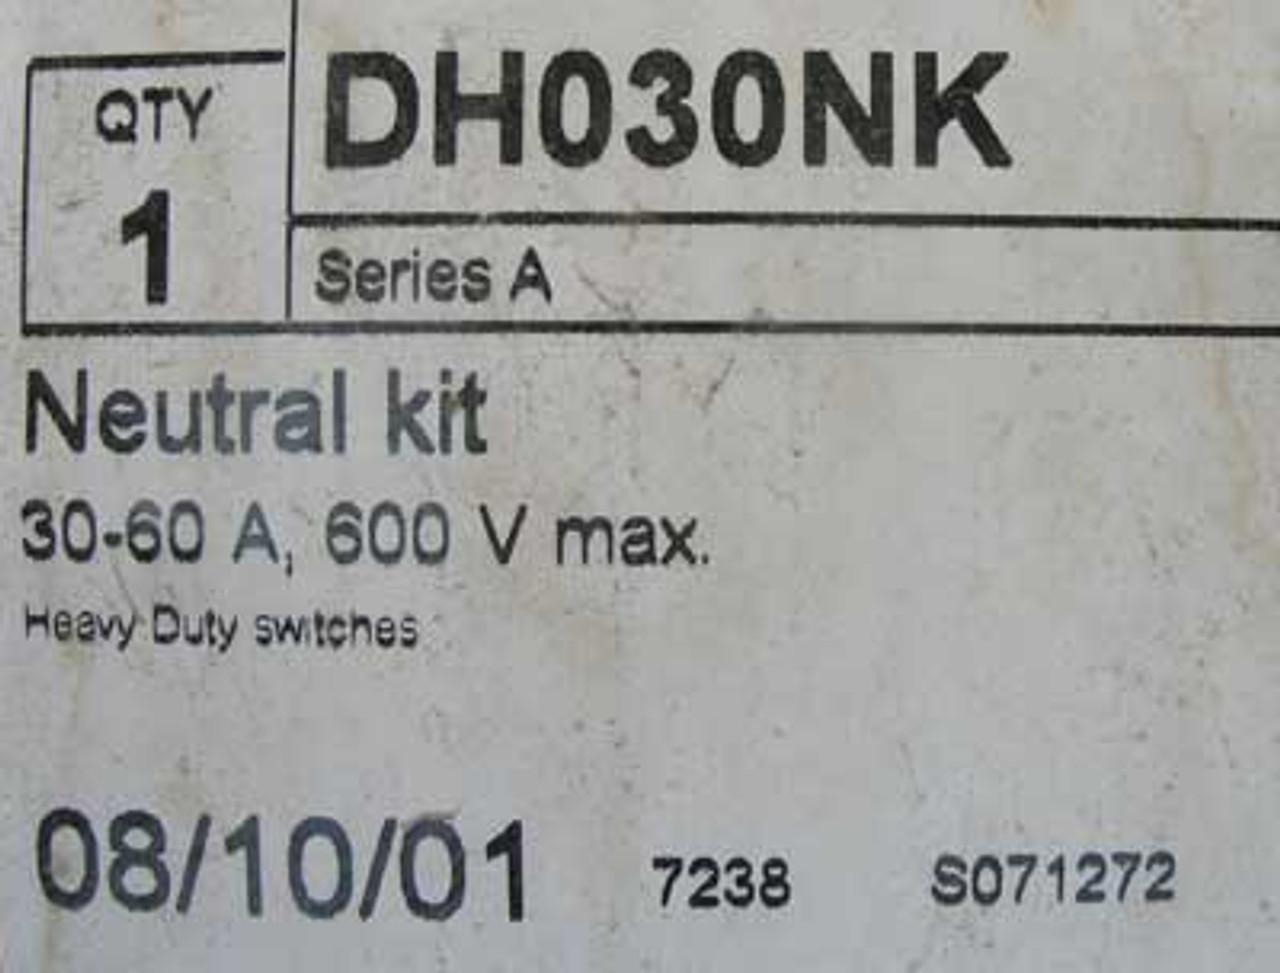 Cutler Hammer DH030NK 30-60 Amp 600V Max Neutral Kit